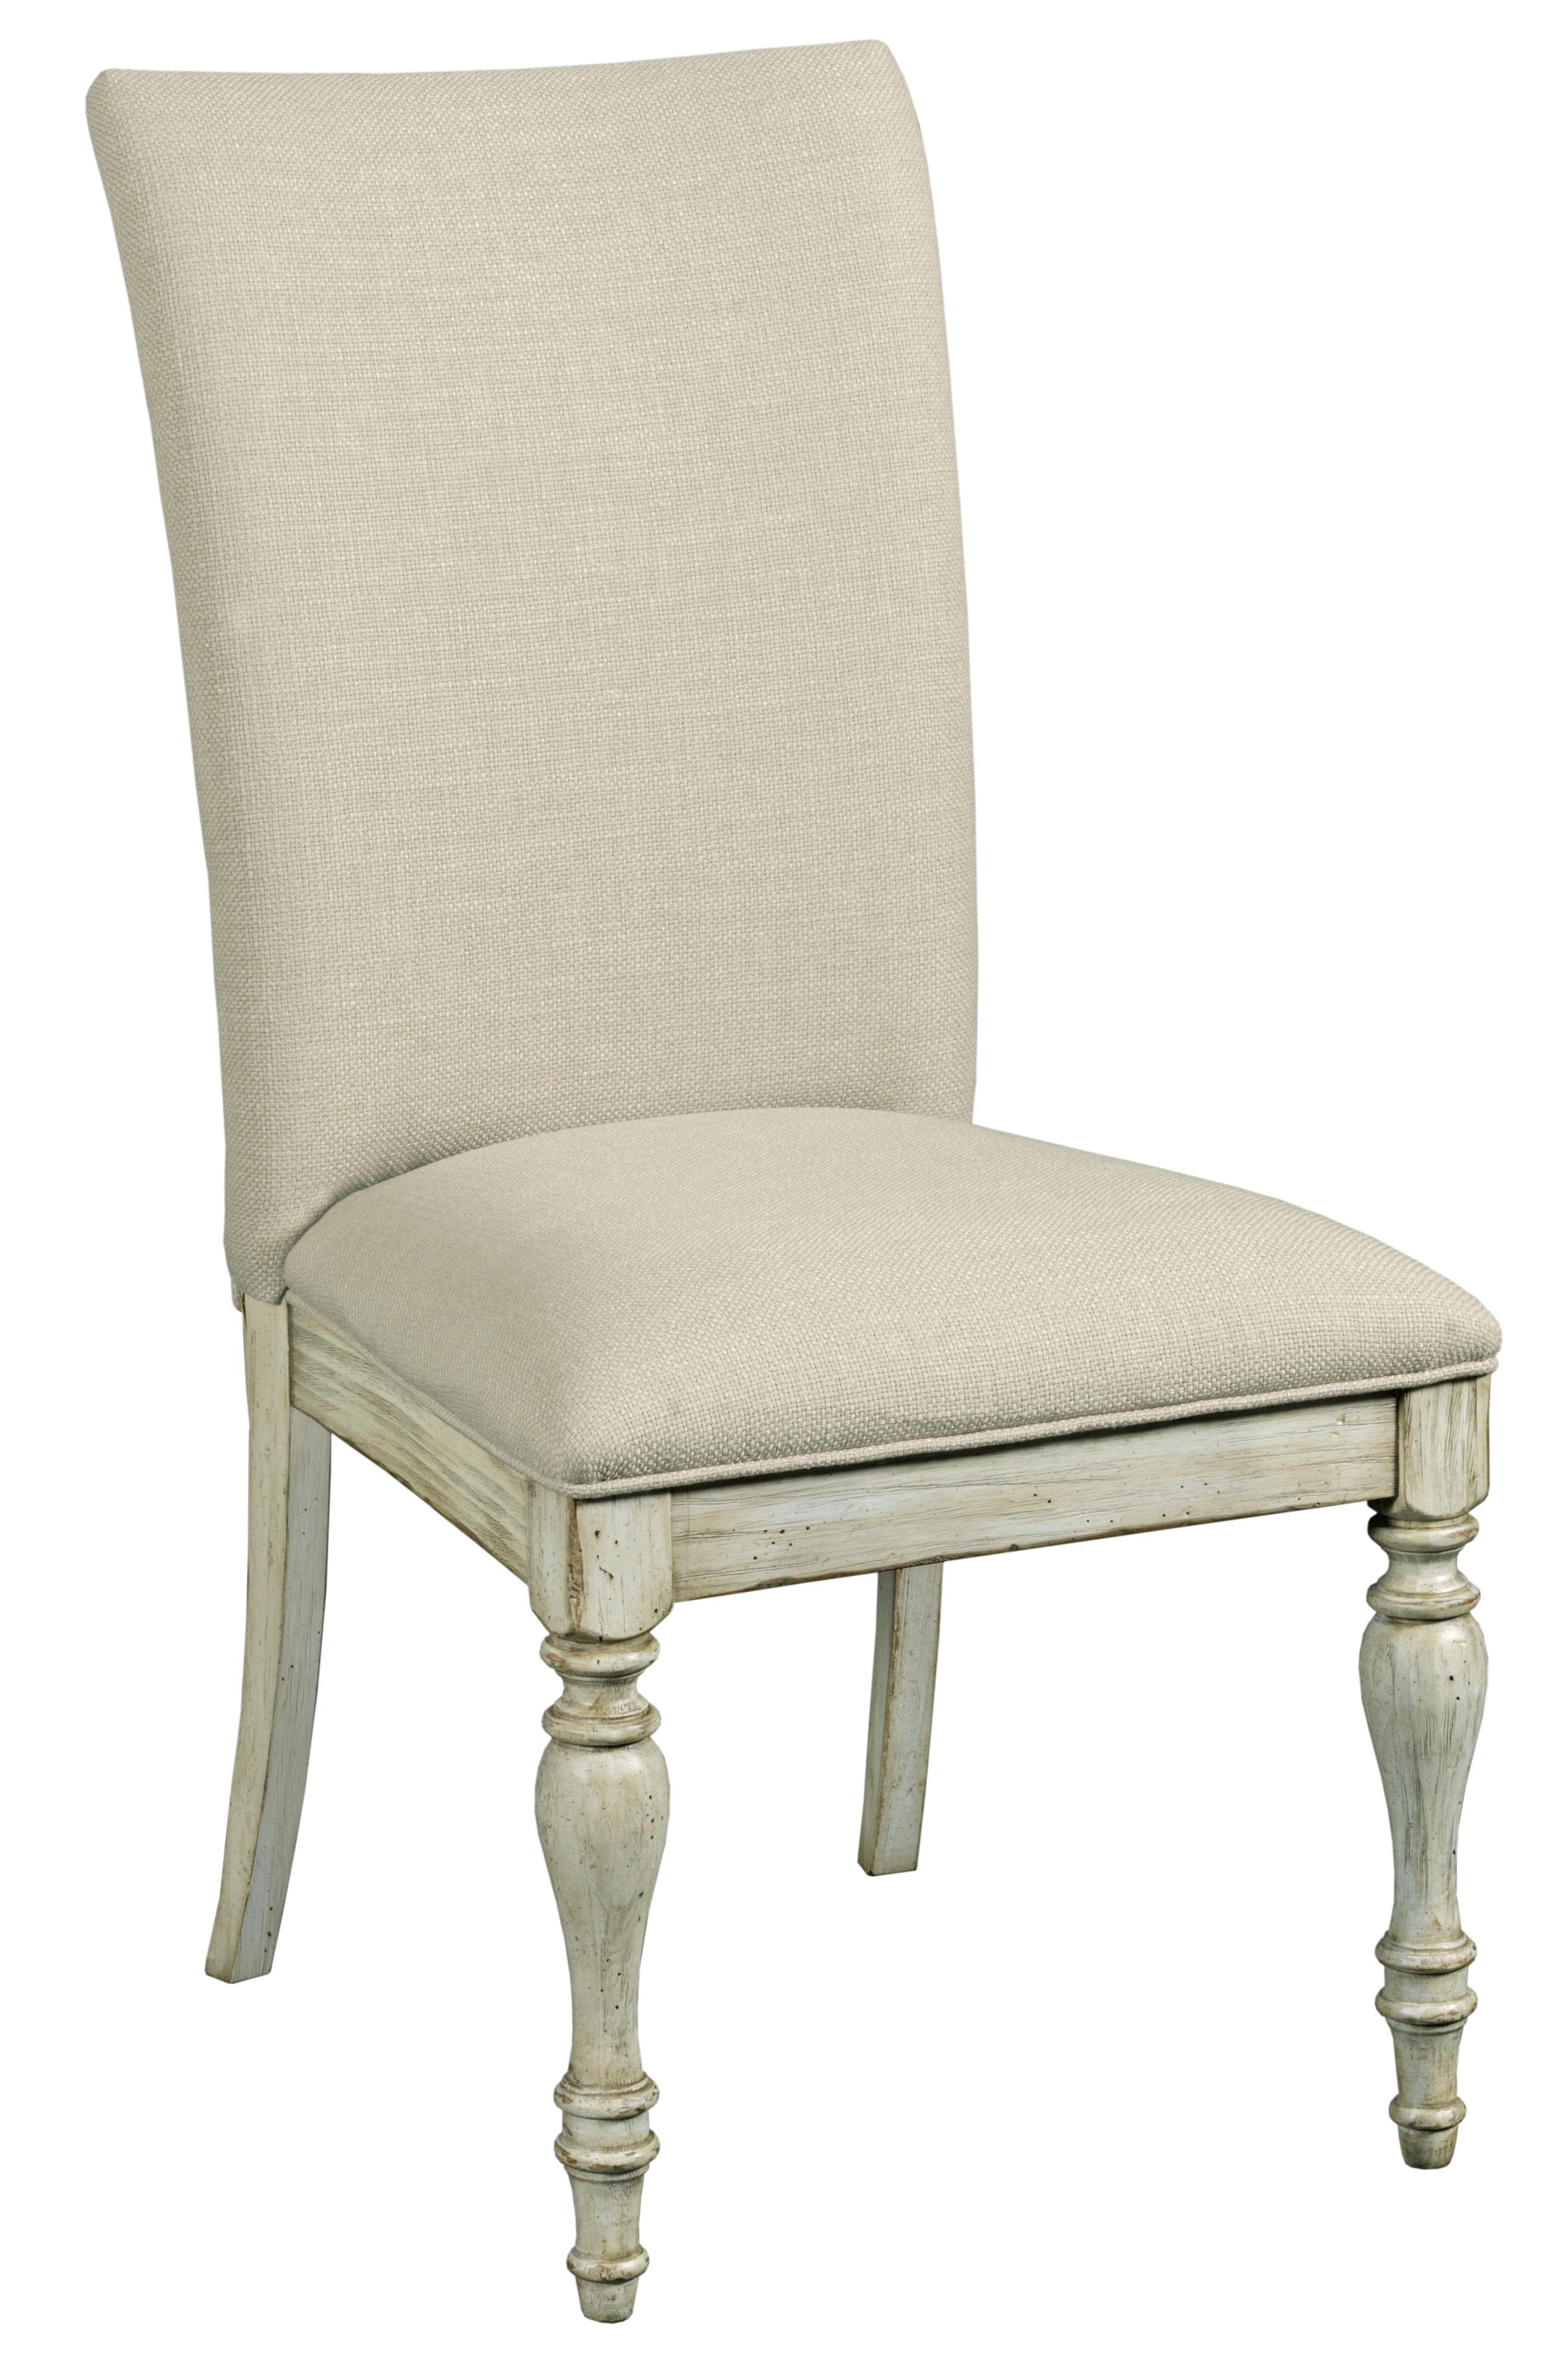 Weatherford Tasman Upholstered Chair by Kincaid Furniture at Jacksonville Furniture Mart